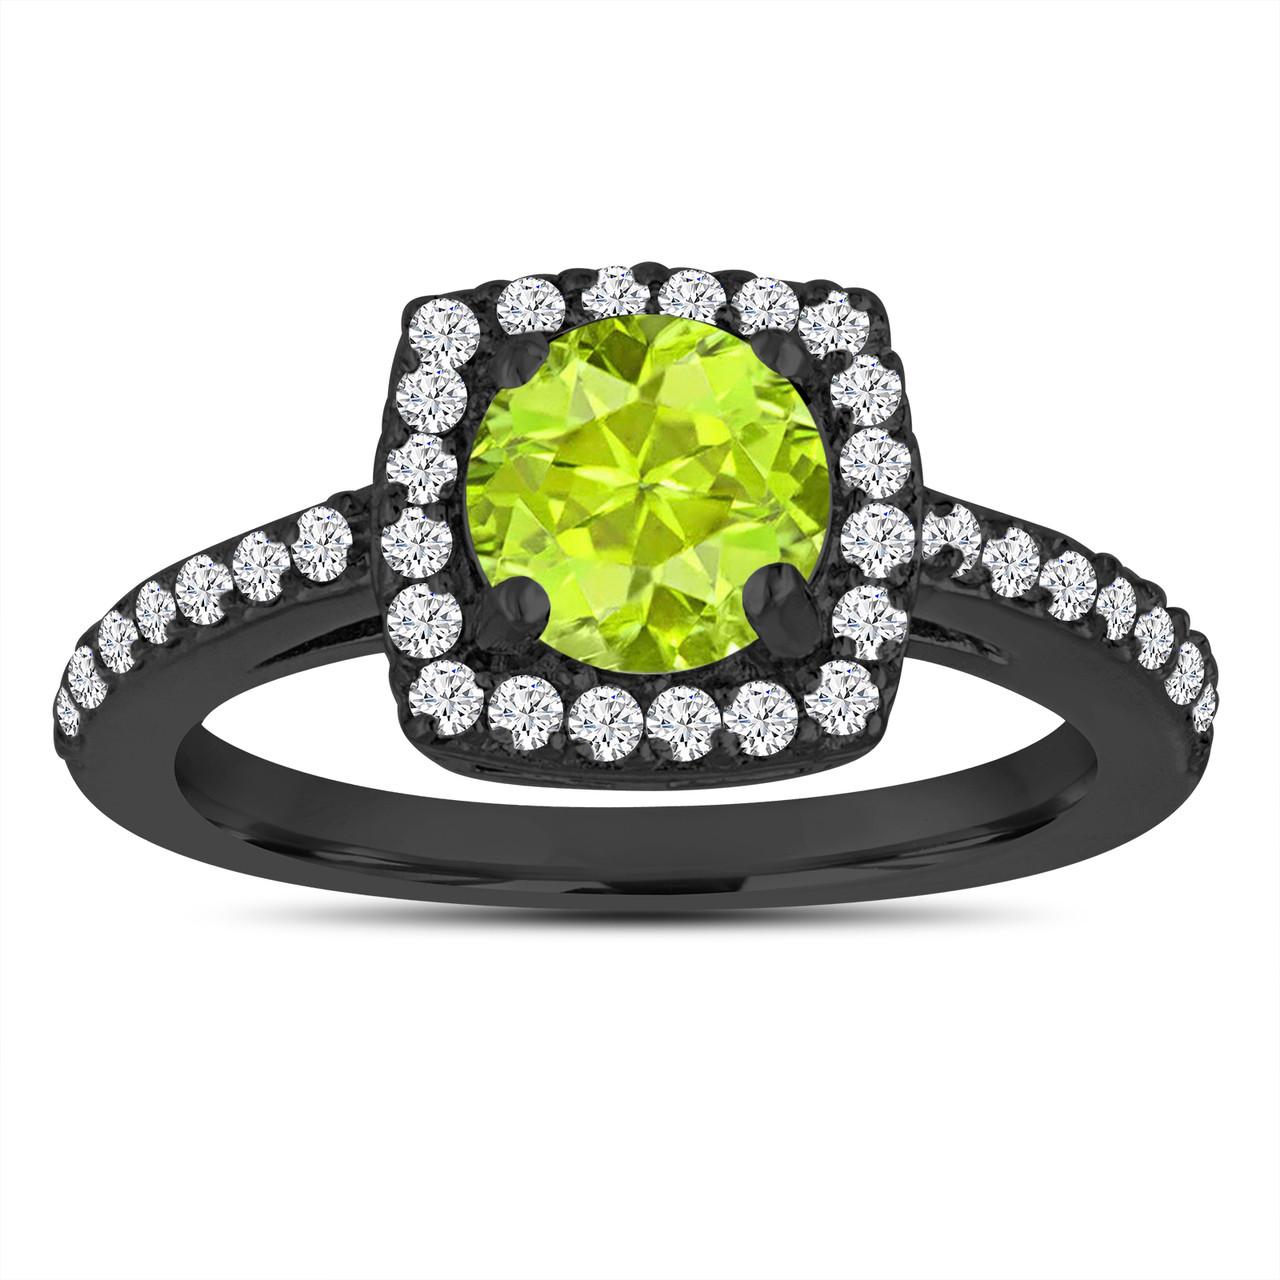 peridot engagement ring wedding ring 14k black gold. Black Bedroom Furniture Sets. Home Design Ideas